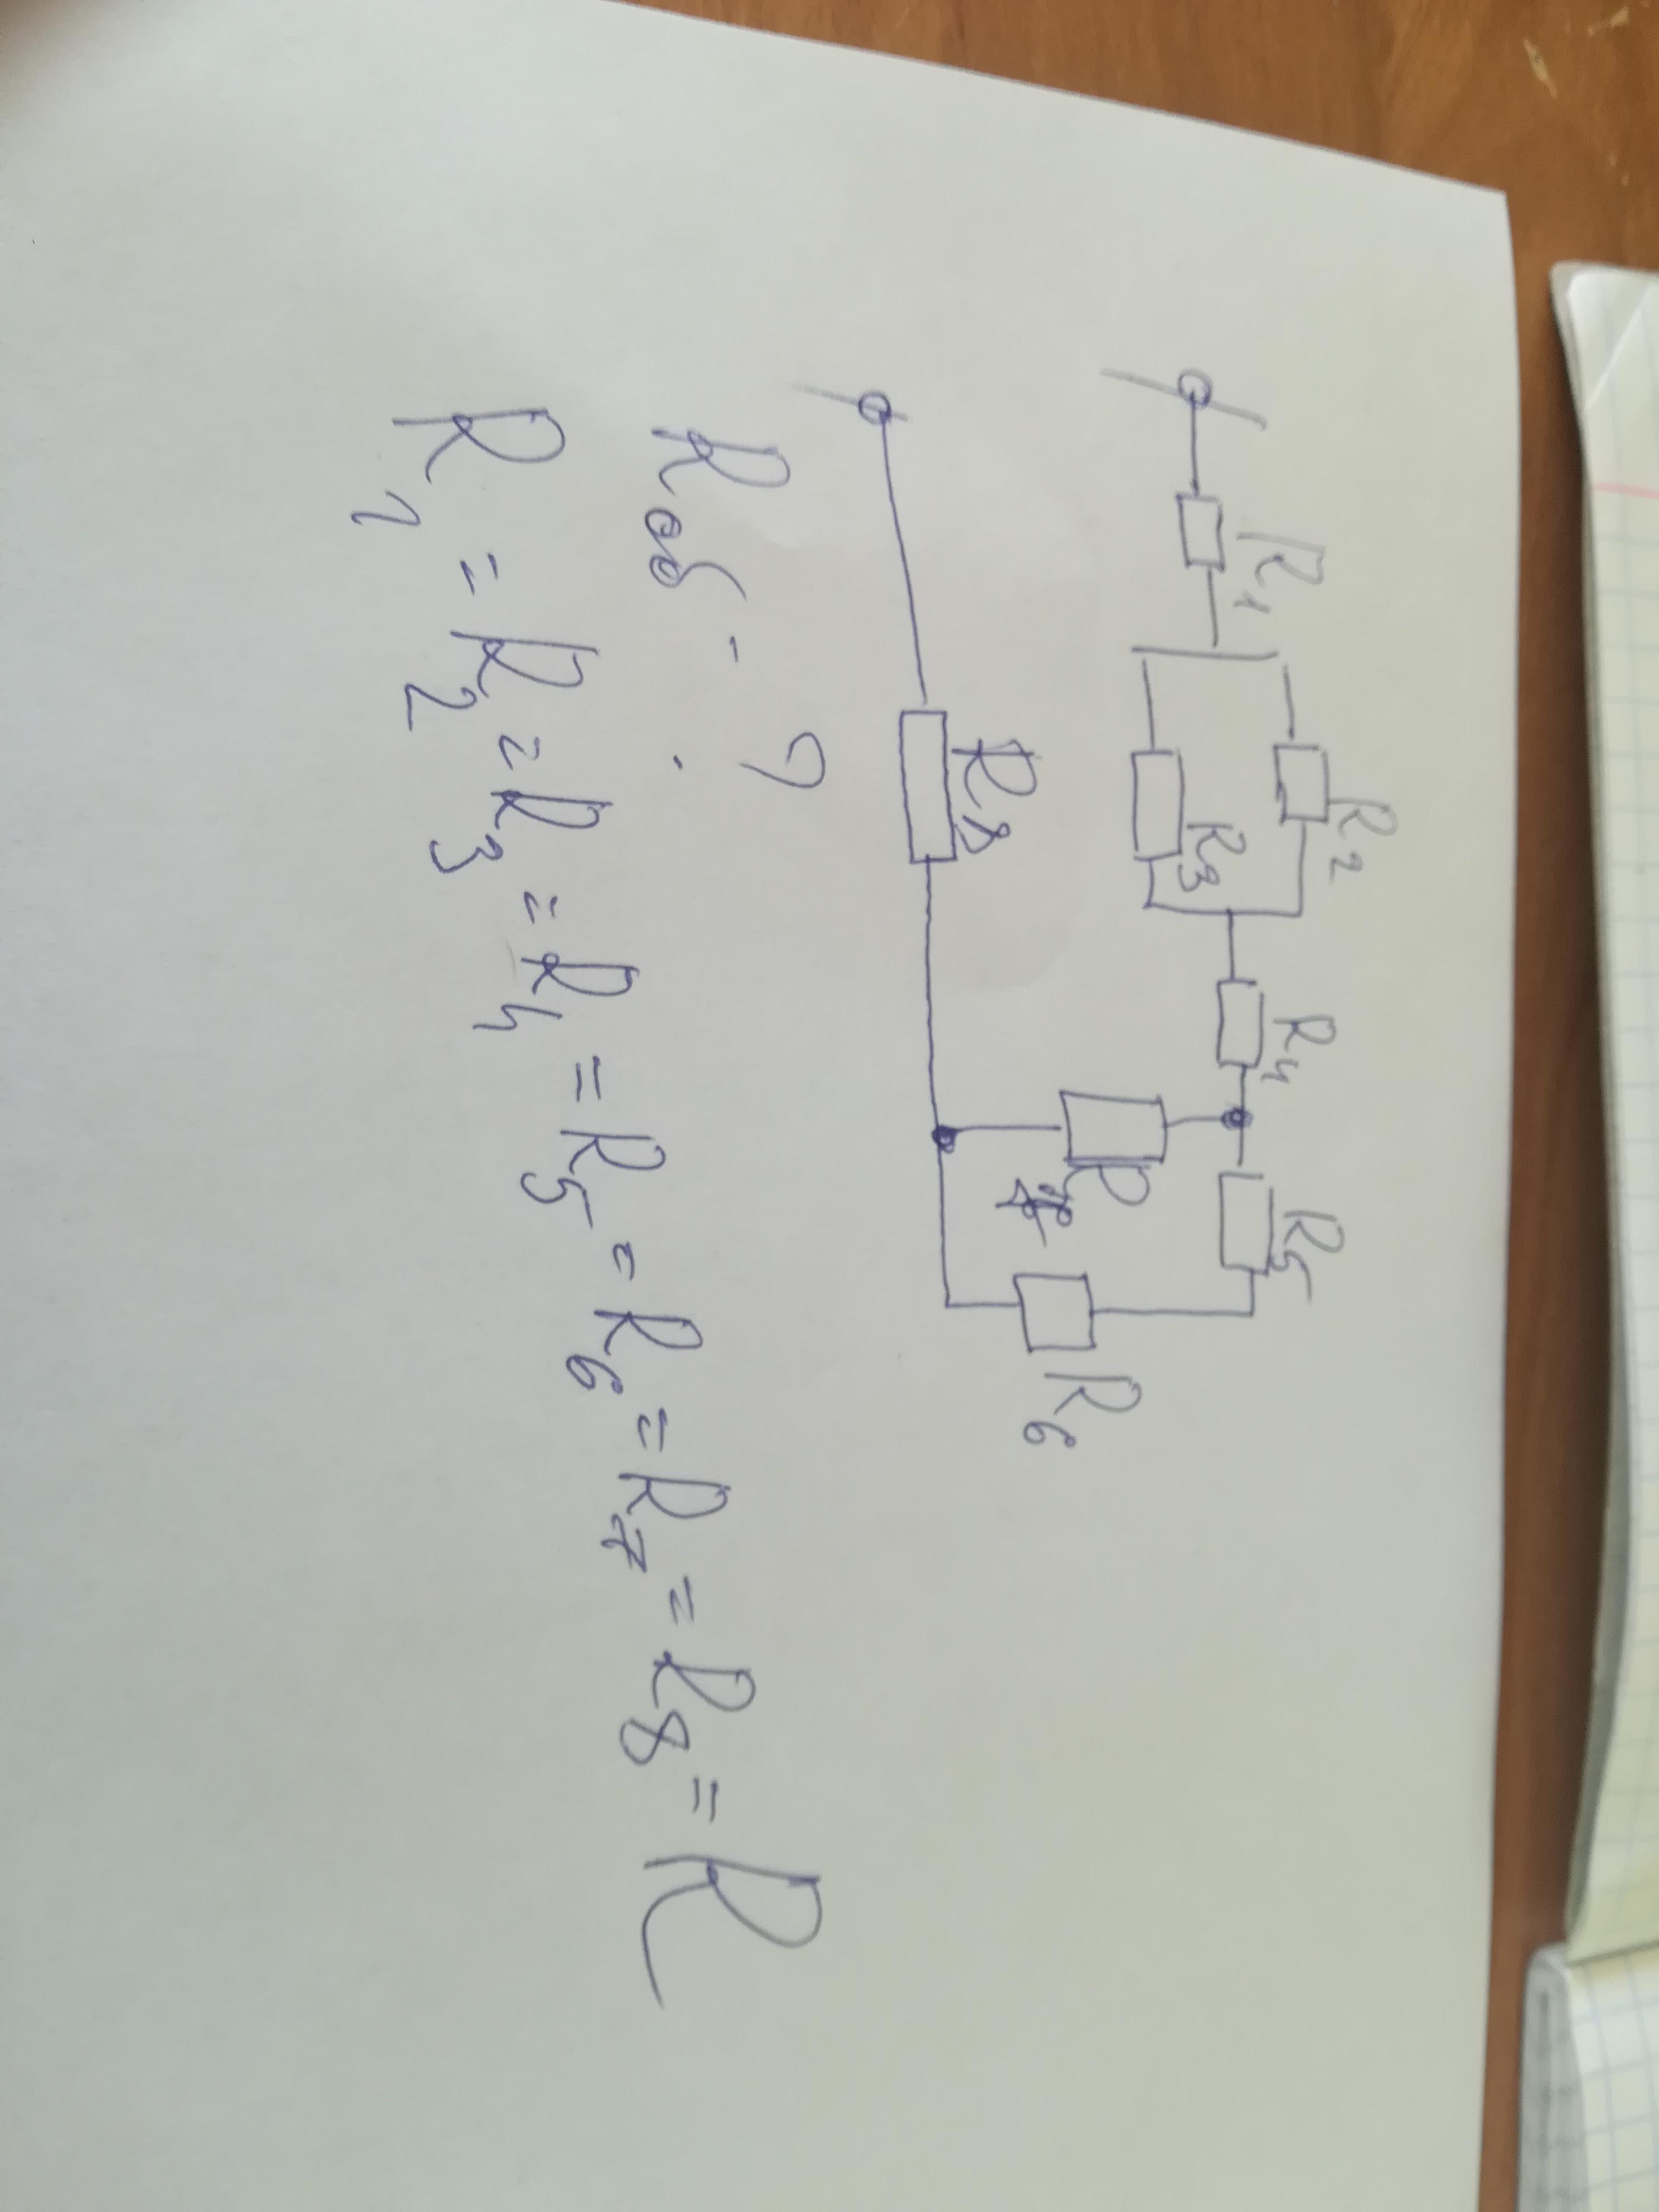 Найти R общую физика